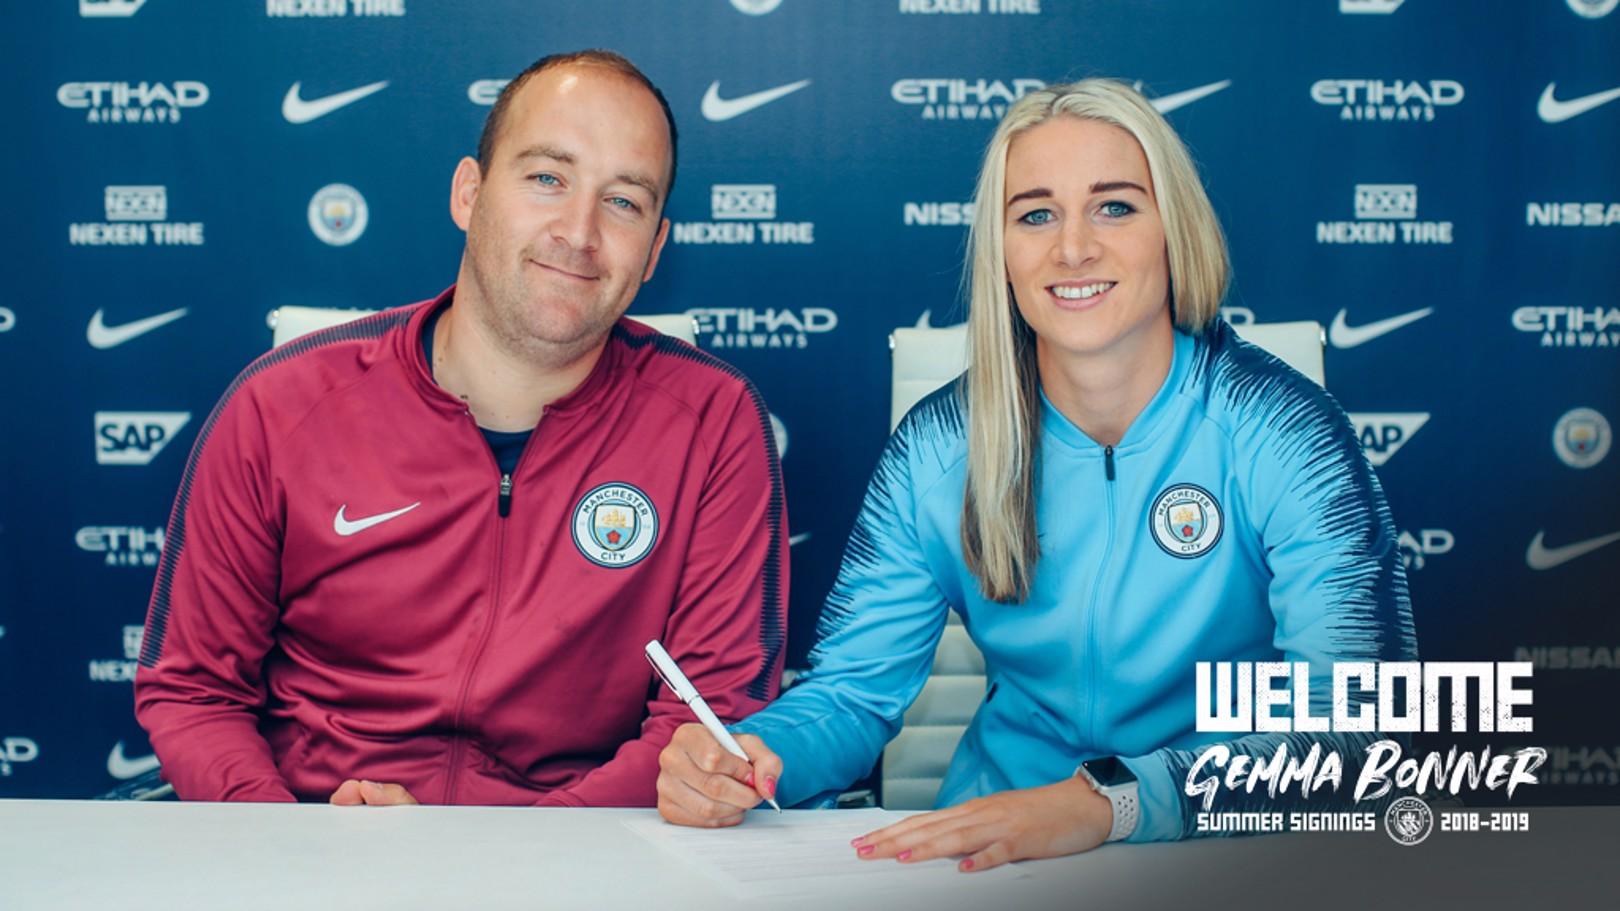 NEW RECRUIT: Defender Gemma Bonner signs for City